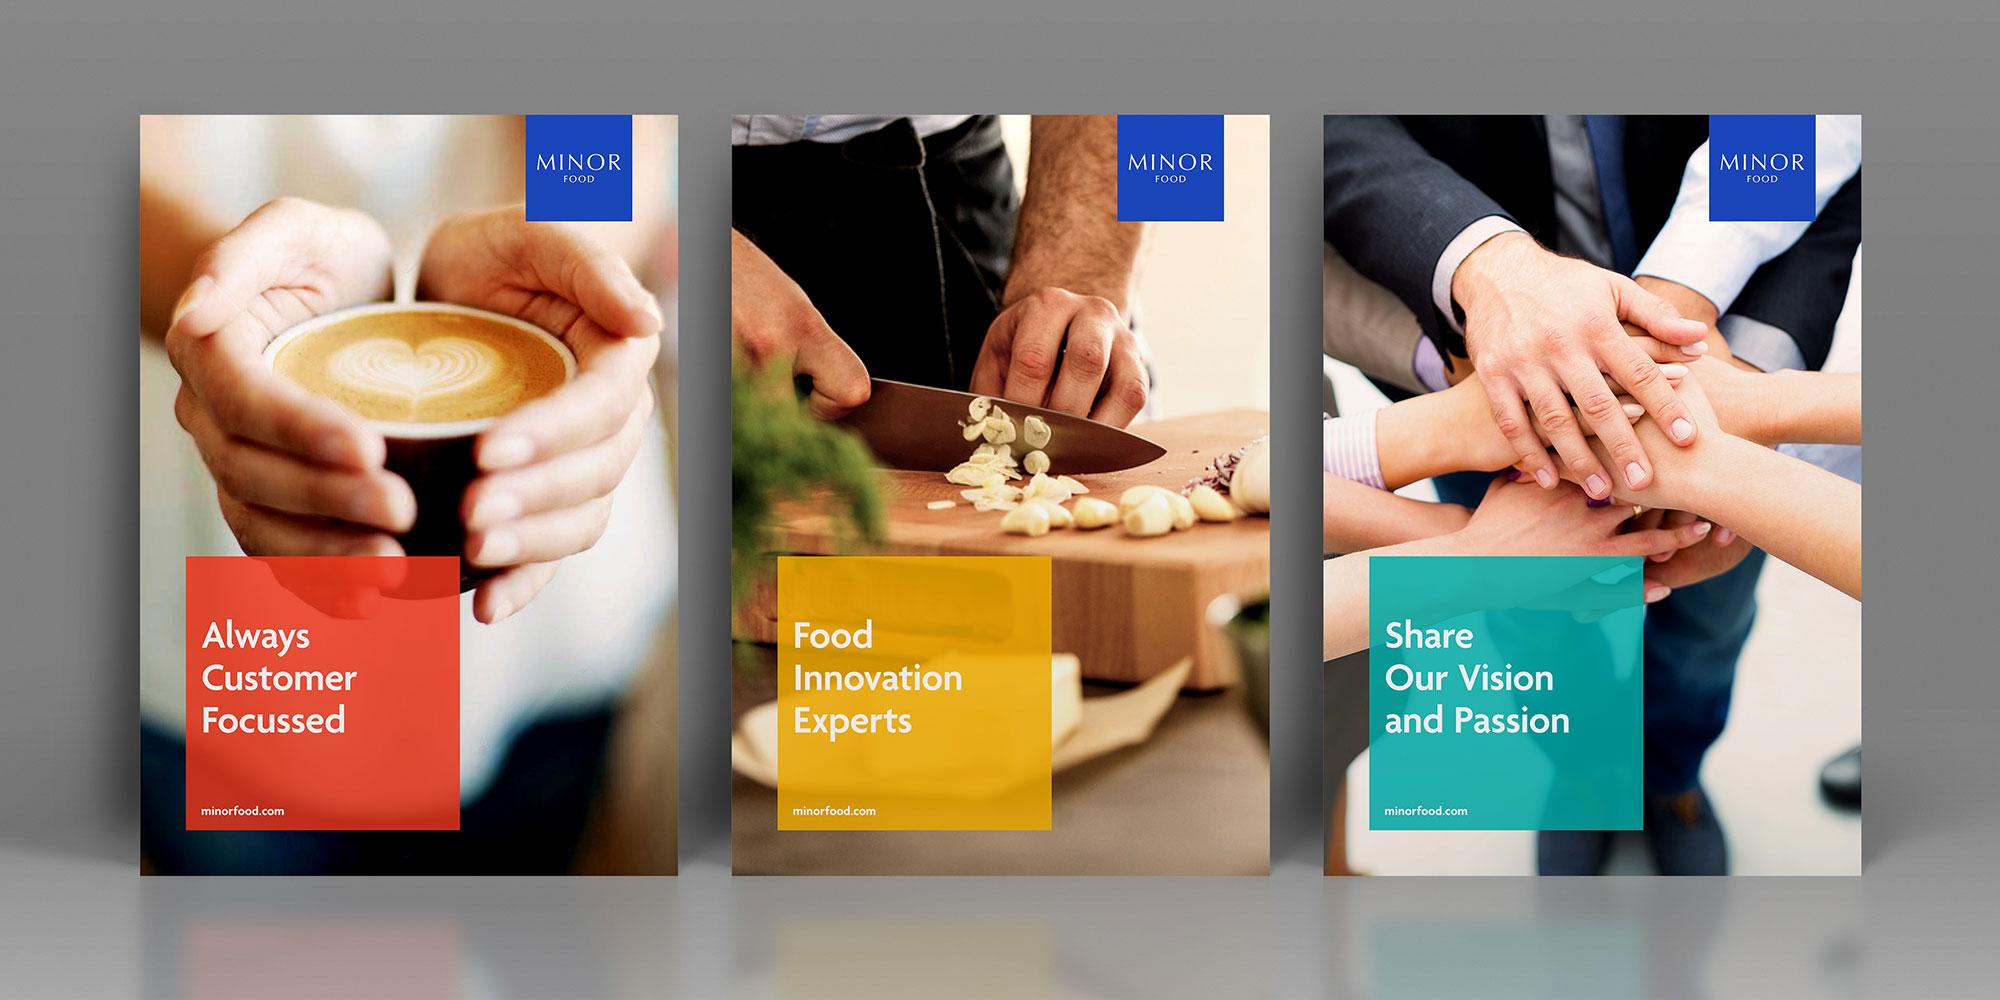 Minor Food Poster Design